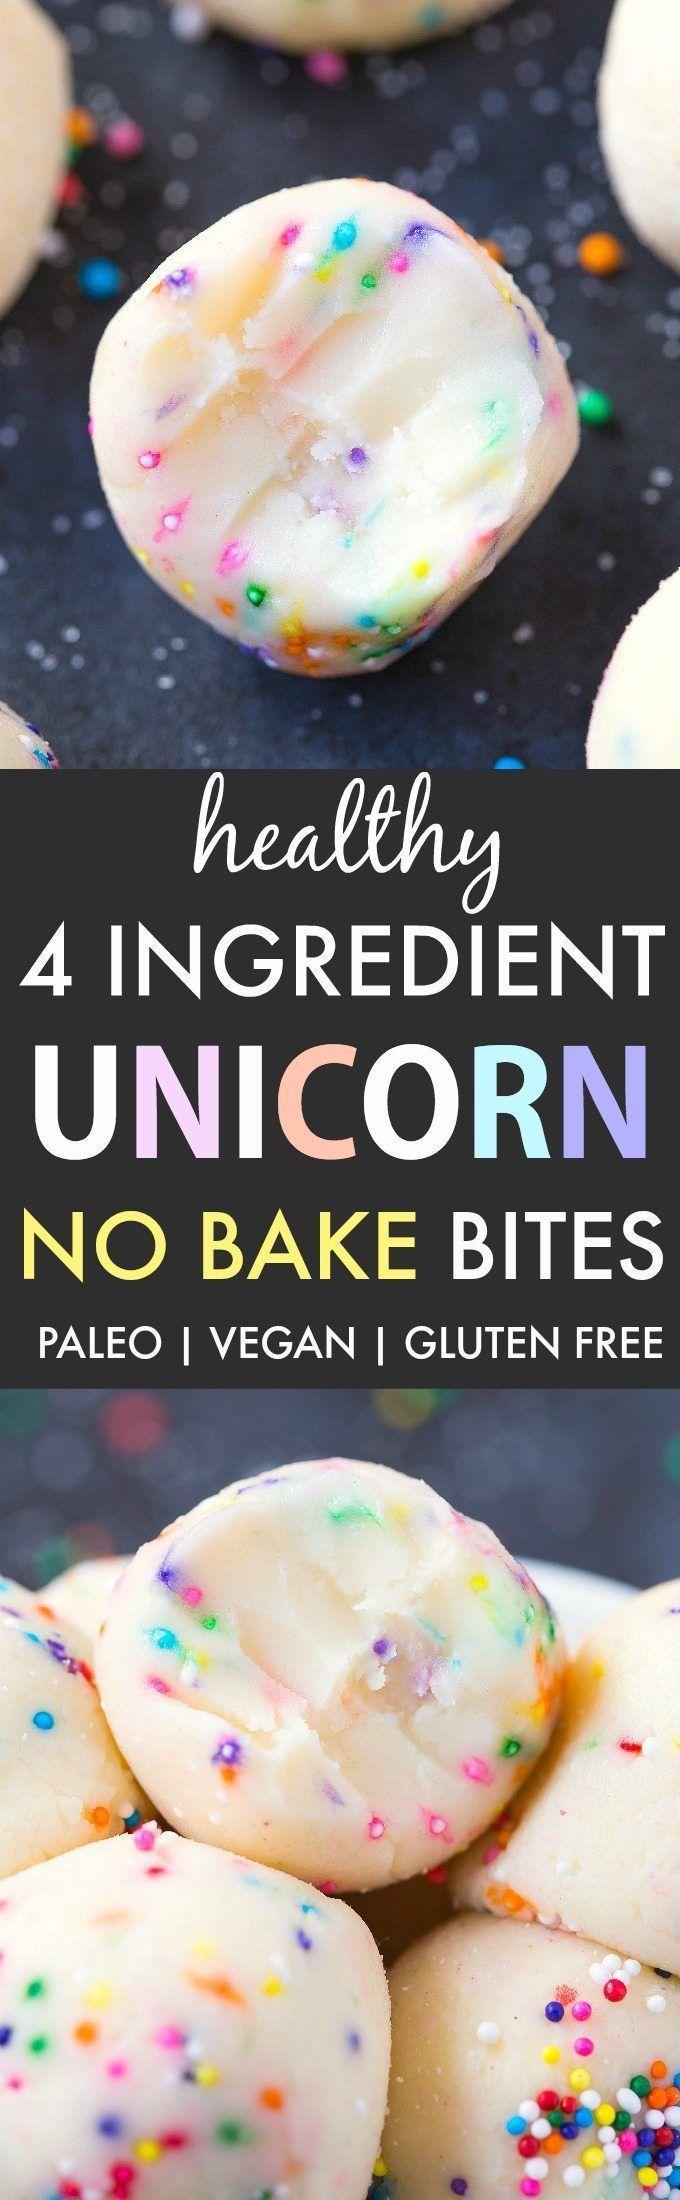 Healthy No Bake Unicorn Bites (V, GF, DF, P)- 4-Ingredient no bake bites inspired by the unicorn frappuccino- Ready in 5 minutes! {vegan, gluten free, paleo recipe}- thebigmansworld.com #unicorn #nobake